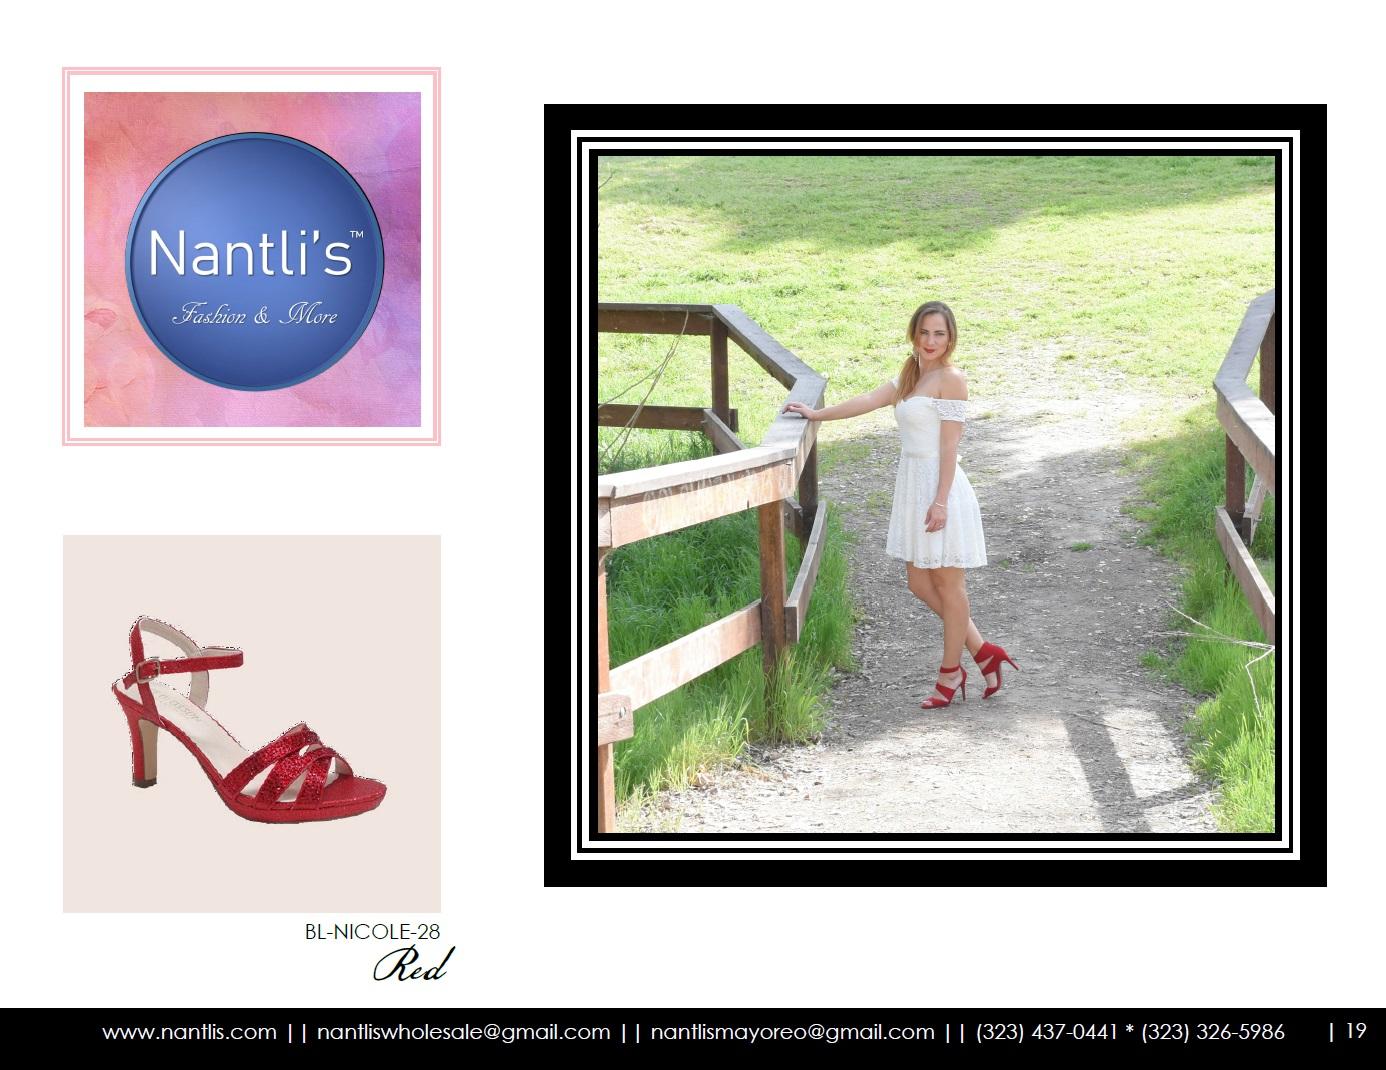 Nantlis Vol BL50 Zapatos de Mujer mayoreo Catalogo Wholesale womens Shoes_Page_19